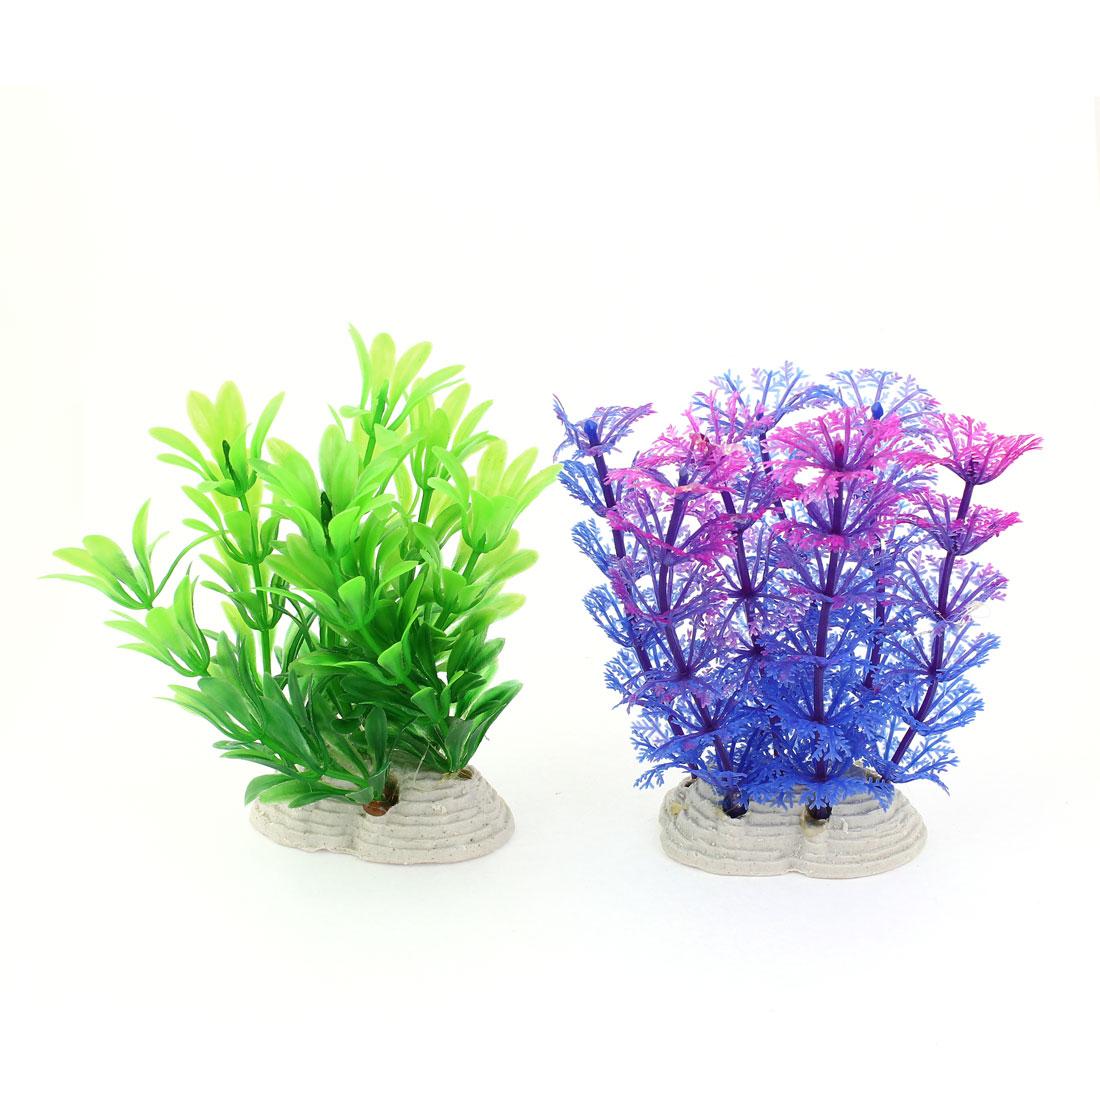 2Pcs 12cm Height Fuchsia Green Blue Plastic Underwater Plant Fish Tank Decoration